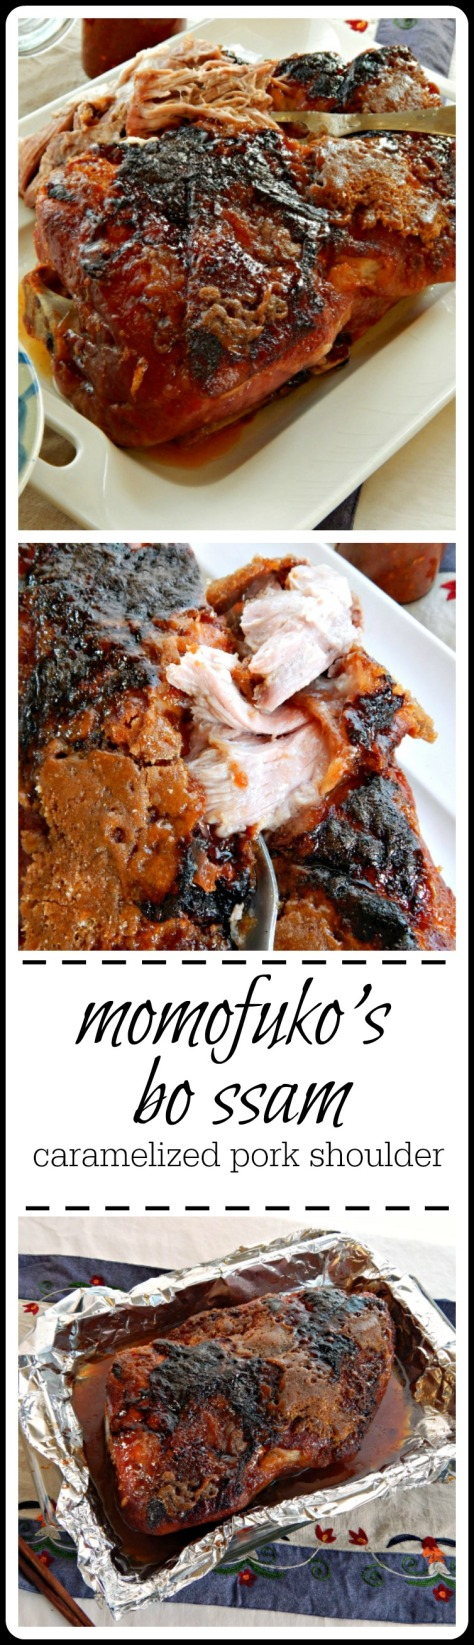 Chef Momofuko's Bo Ssam - caramelized pork shoulder for wraps = insanely good!!